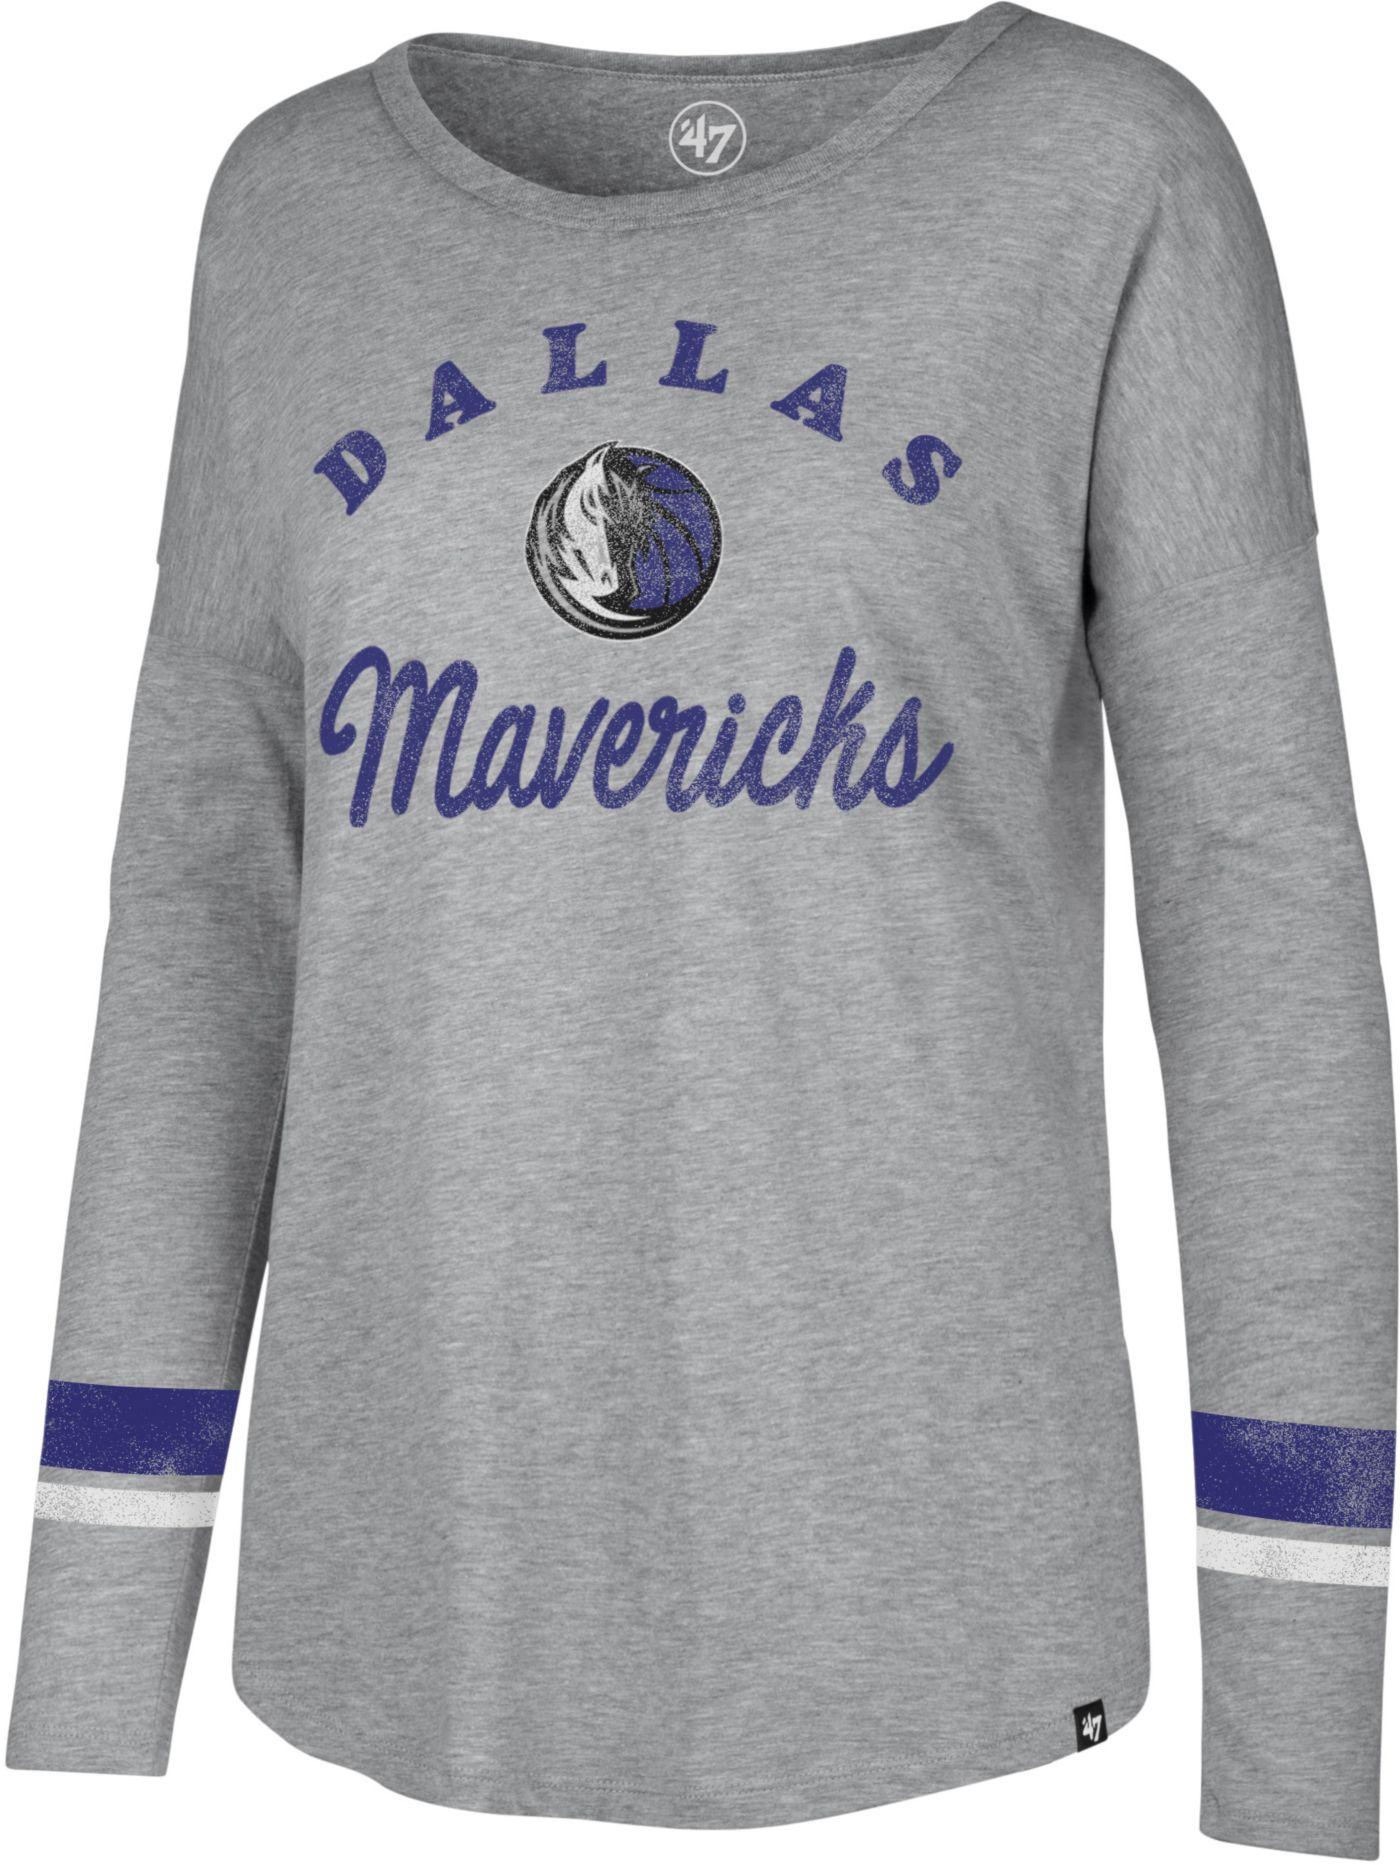 '47 Women's Dallas Mavericks Long Sleeve Shirt